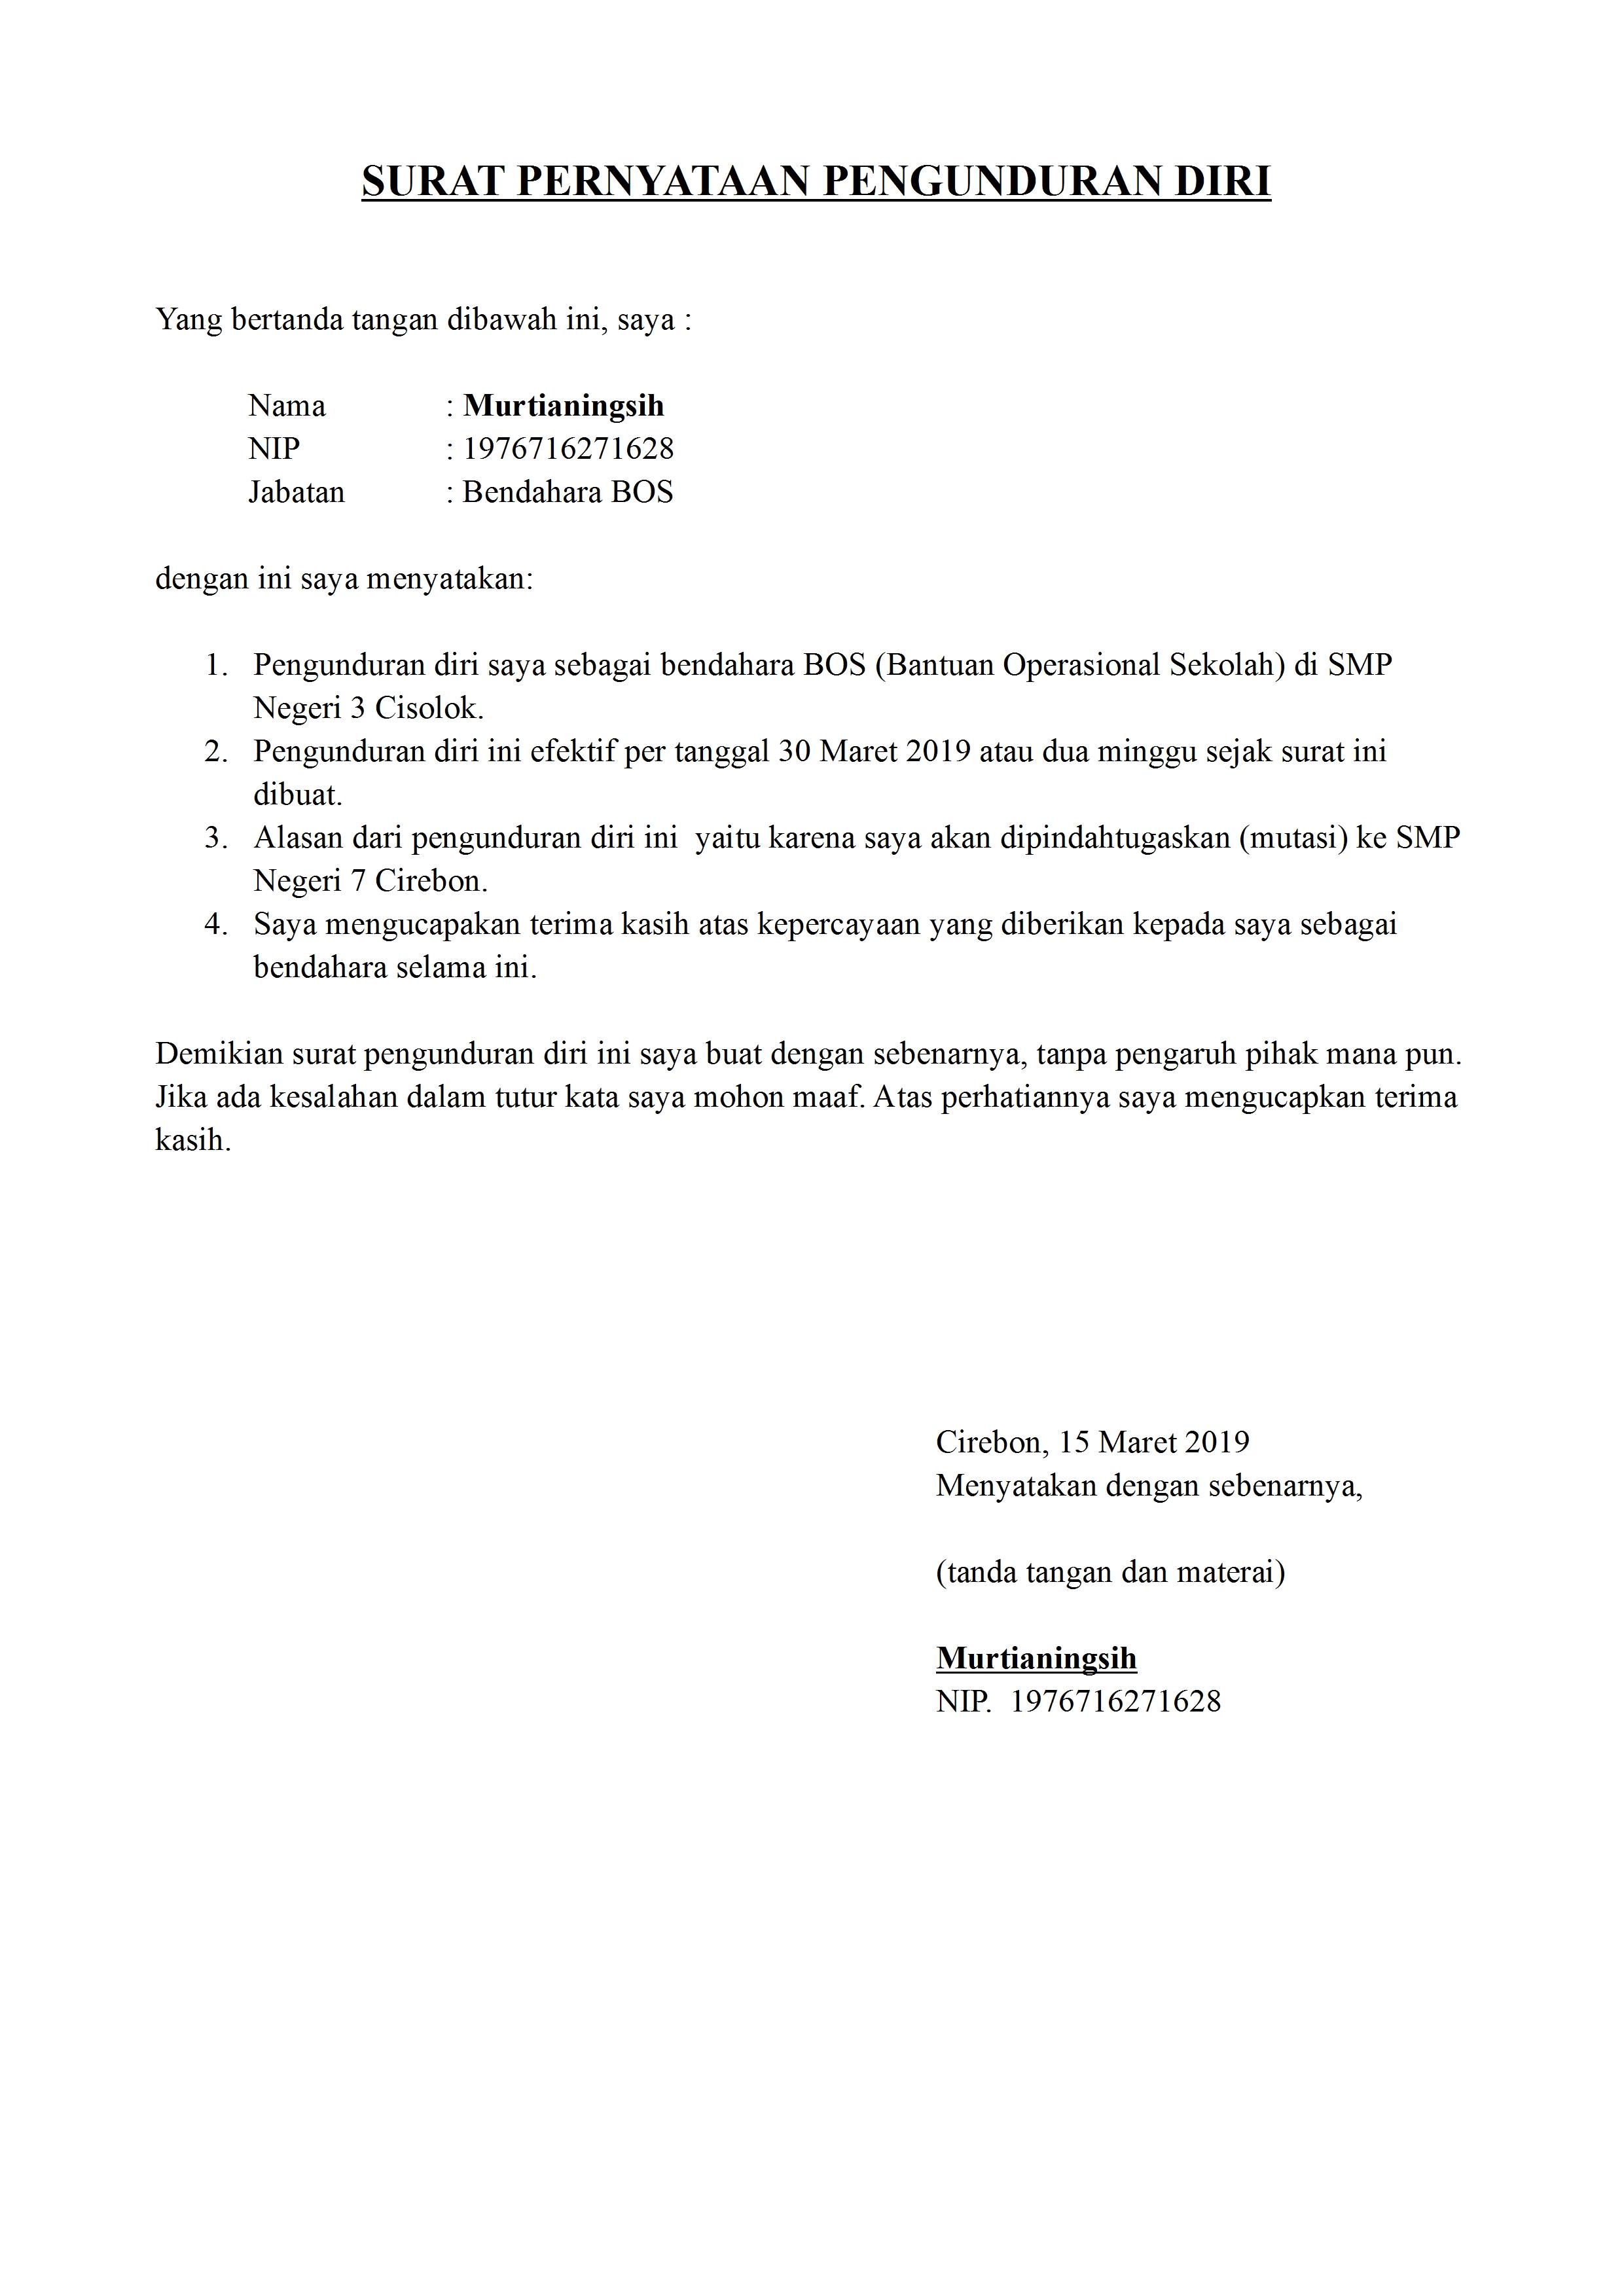 30++ Contoh surat pengunduran diri jd rt terbaru yang baik dan benar